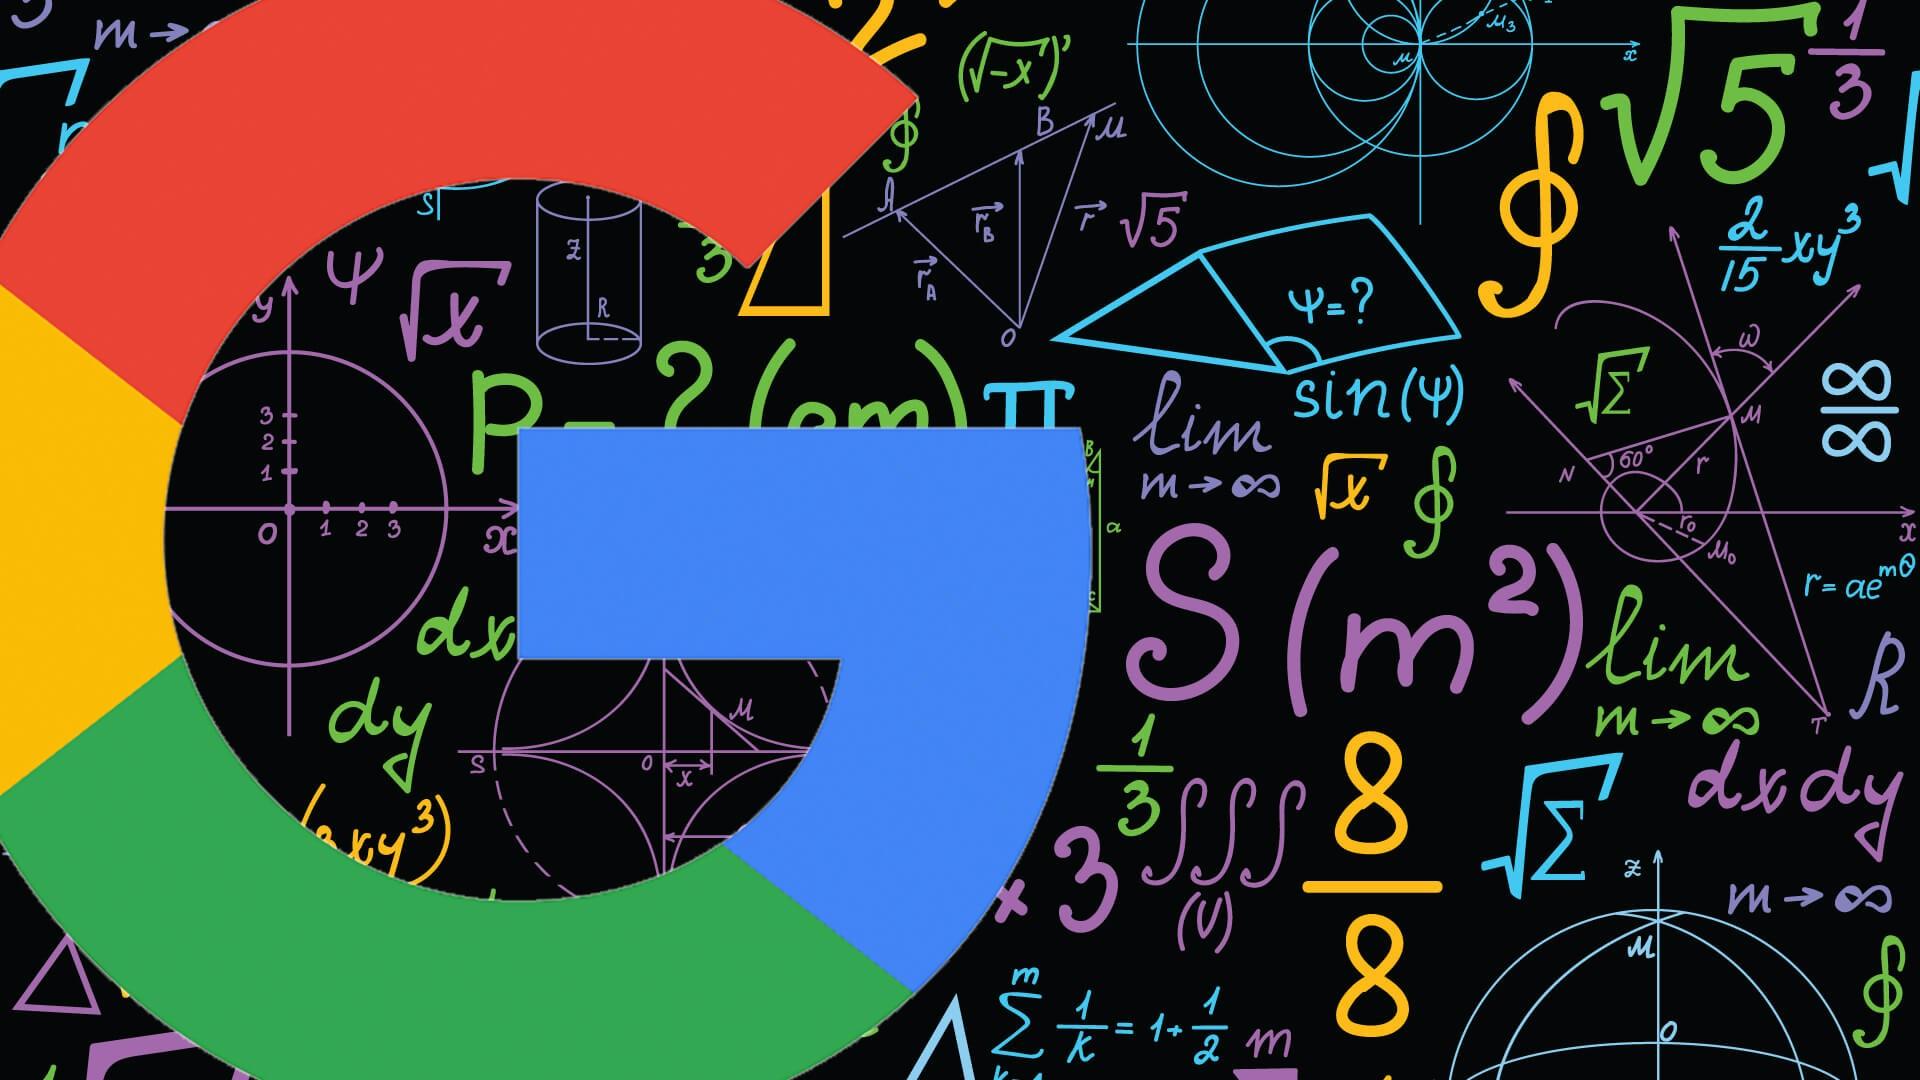 شیوه کار الگوریتم جدید گوگل